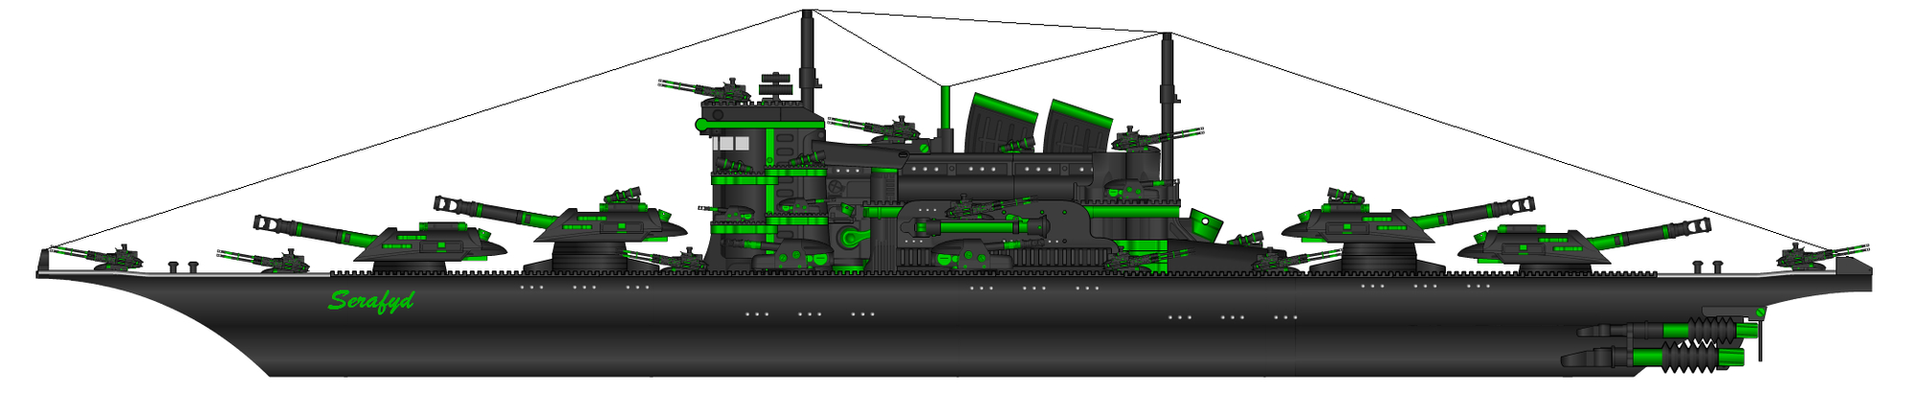 K.M. Serafyd Battleship by HaX0r332